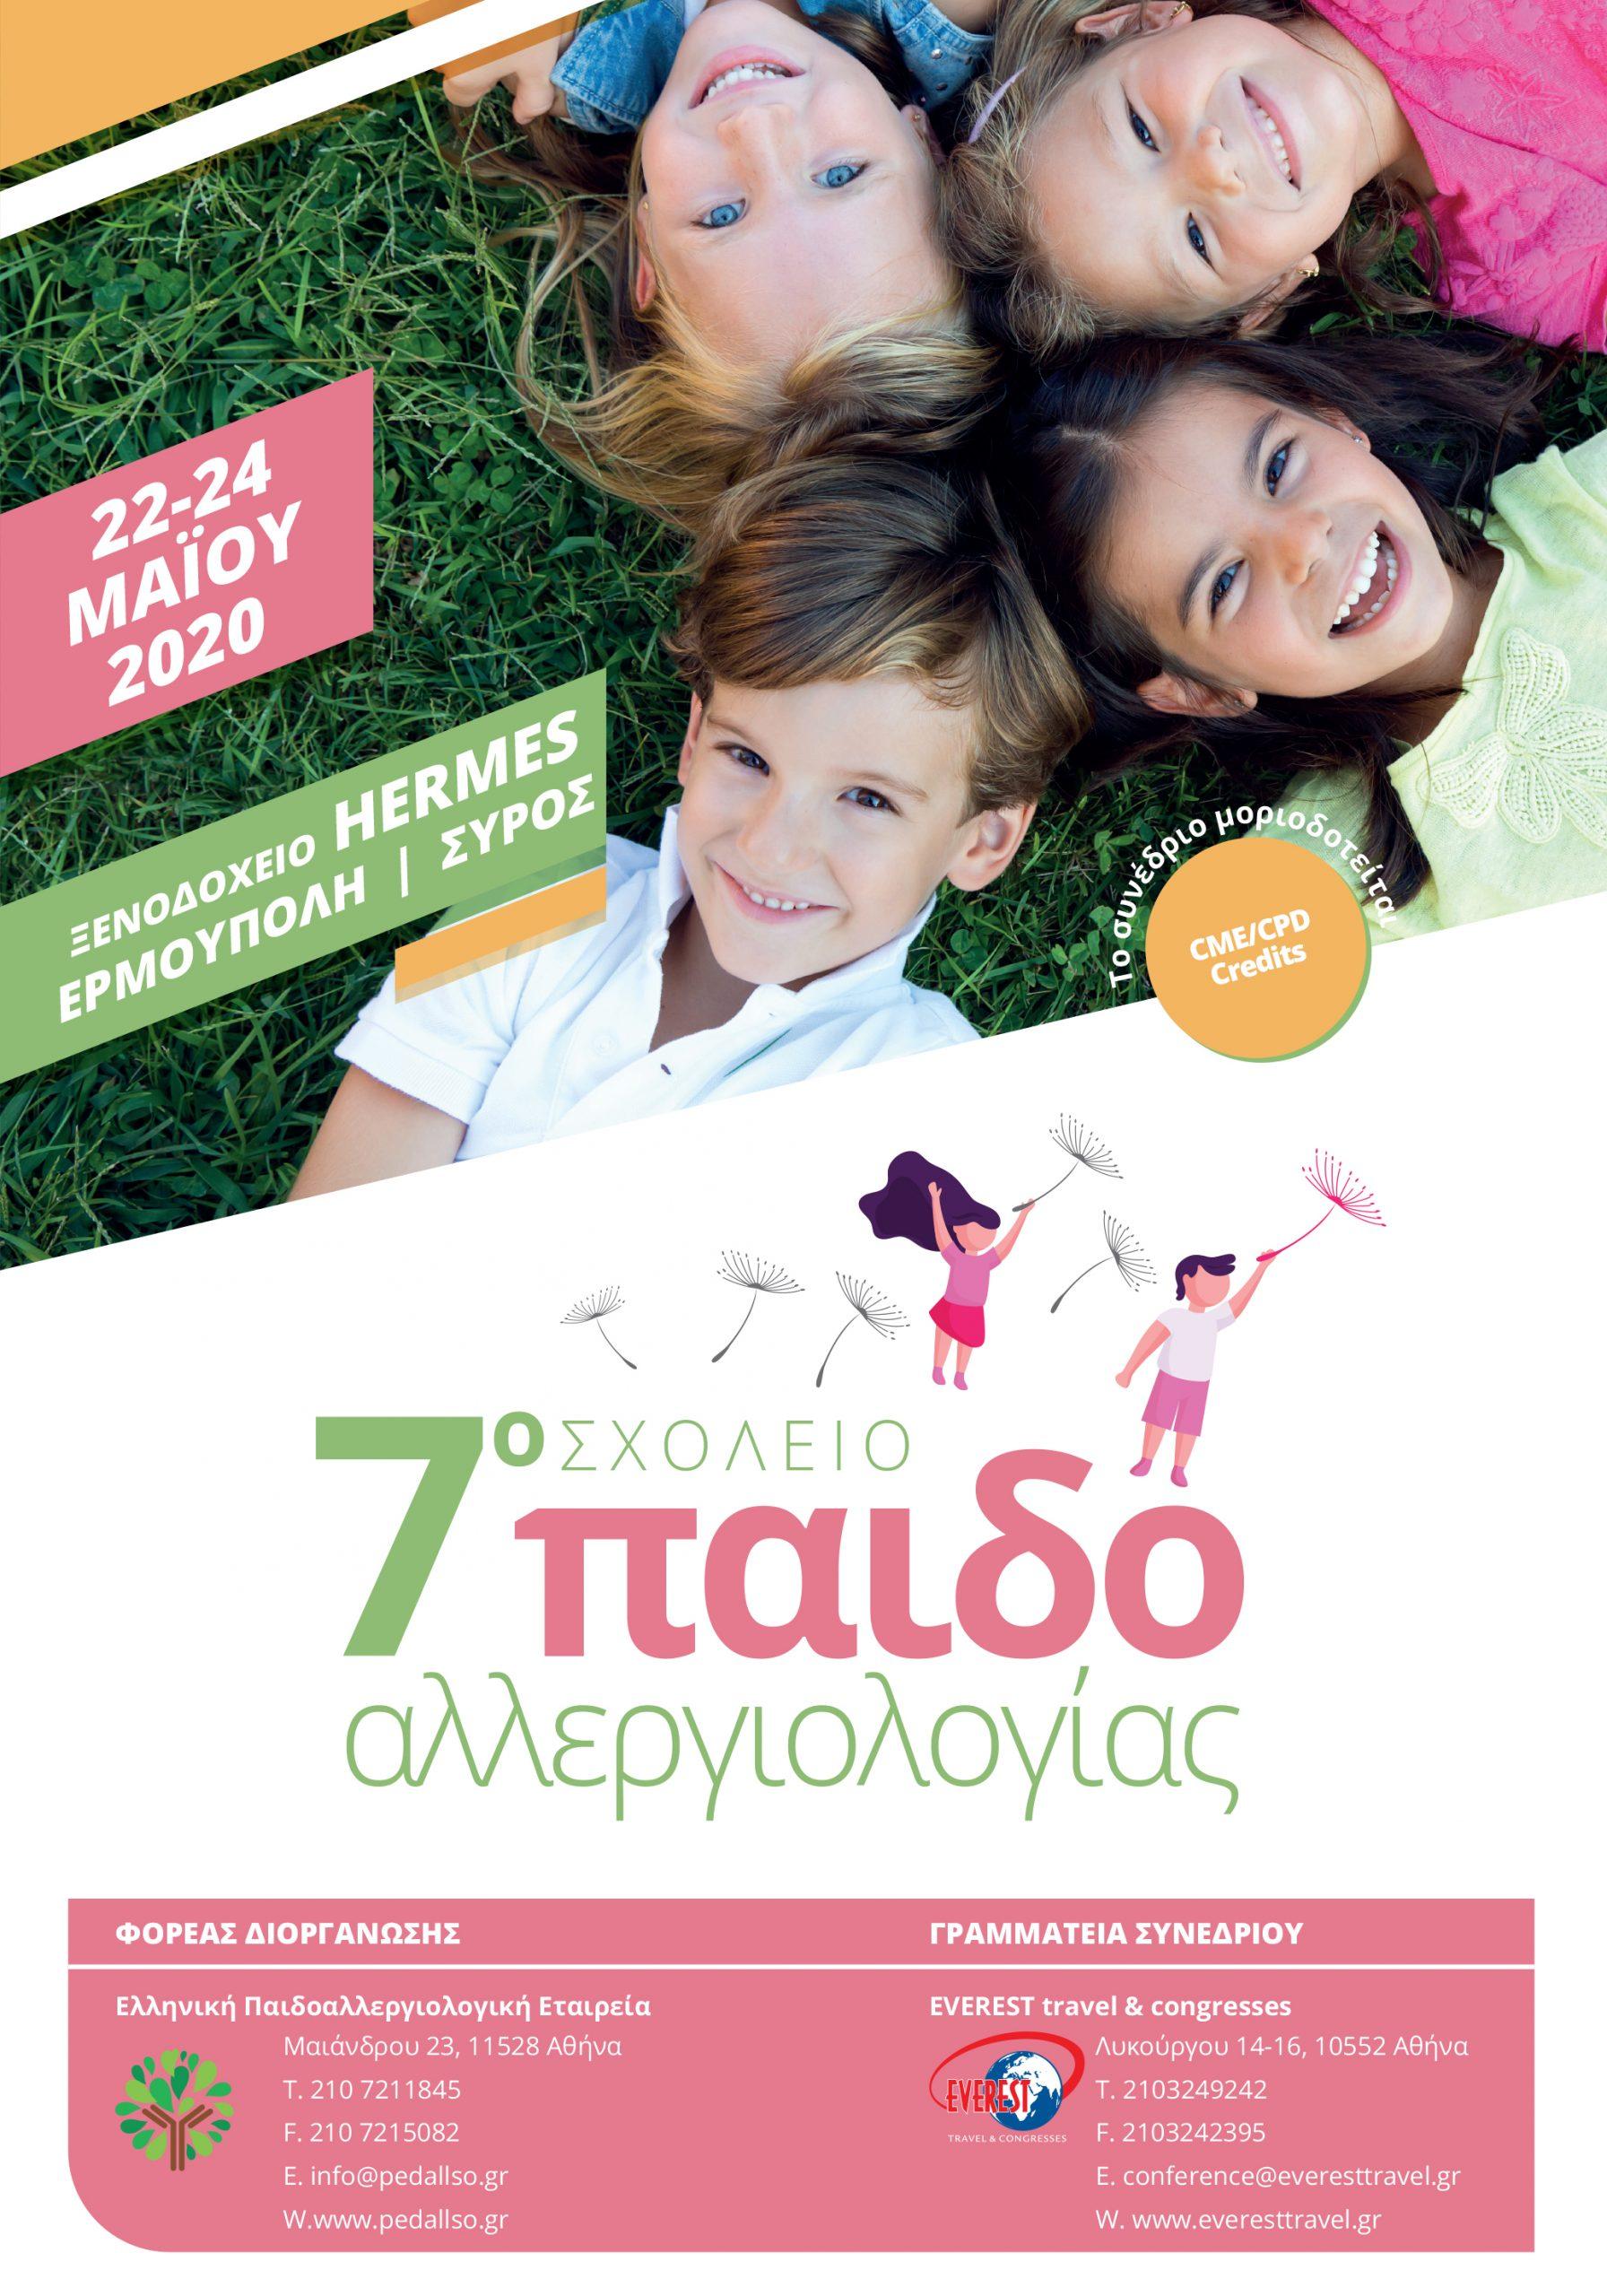 7o Σχολείο Παιδοαλλεργιολογίας